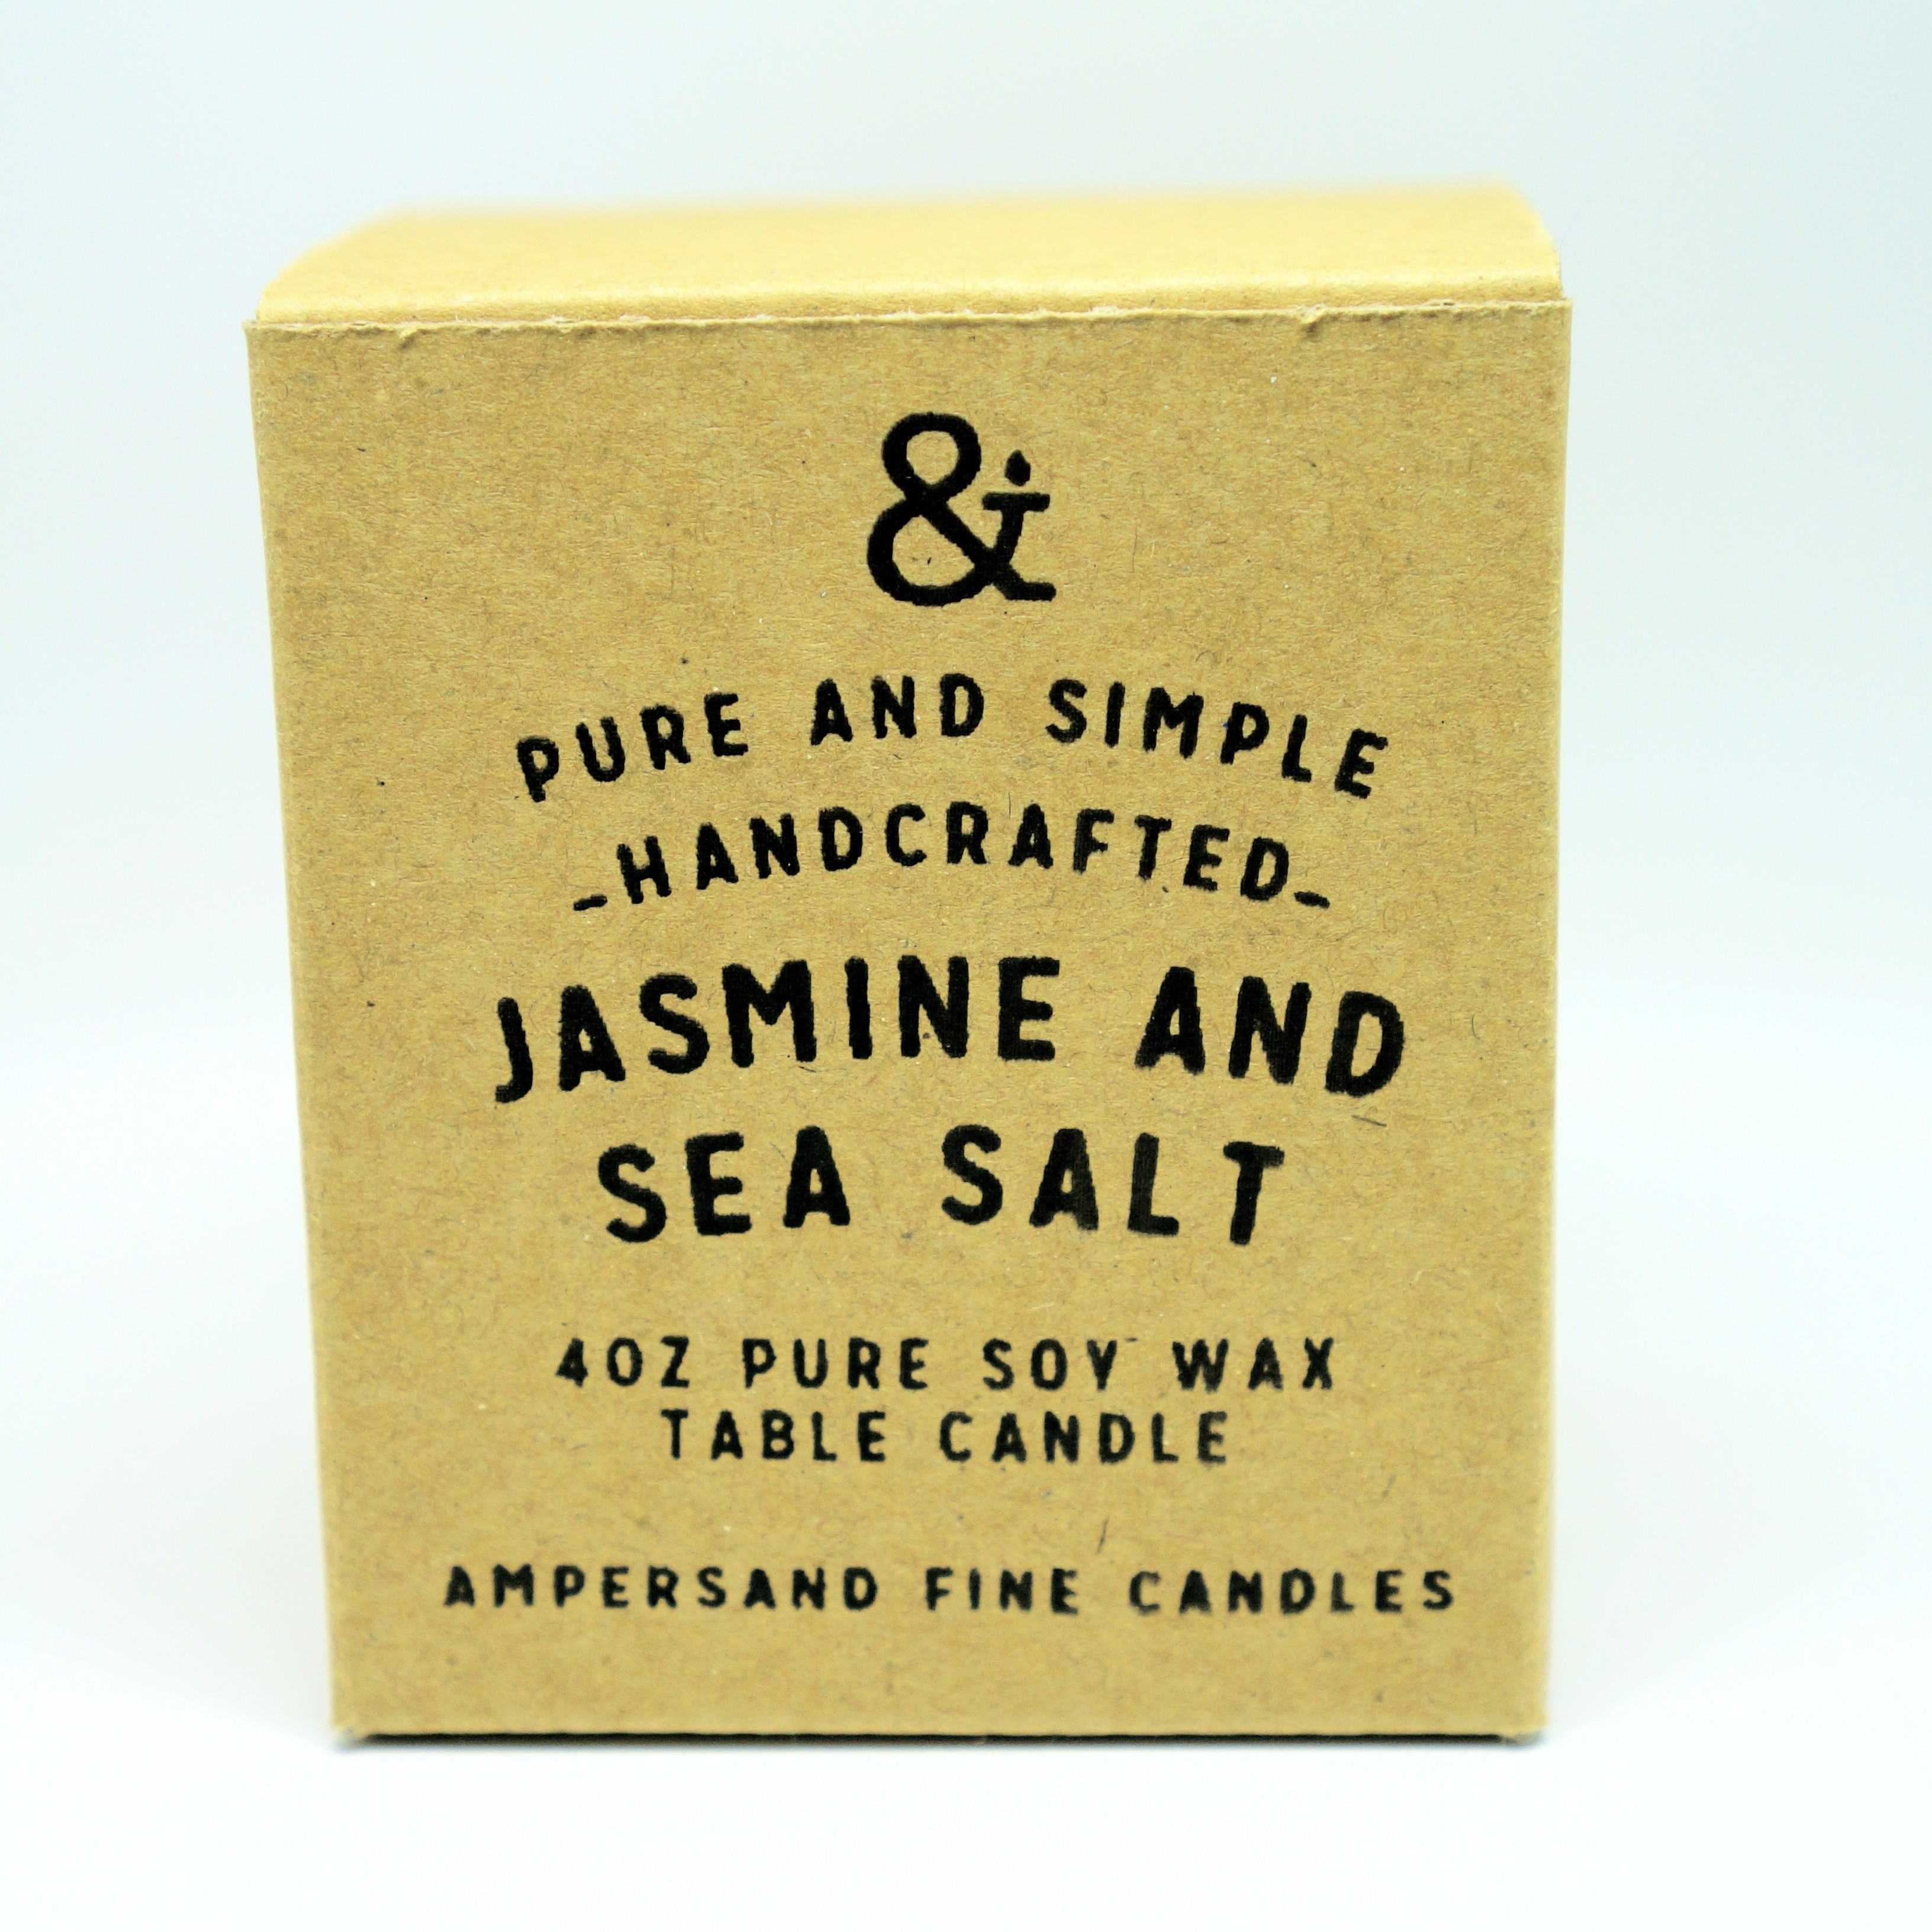 4oz Amber Jar Candle -JASMINE AND SEA SALT- キャンドル Candles - 画像1